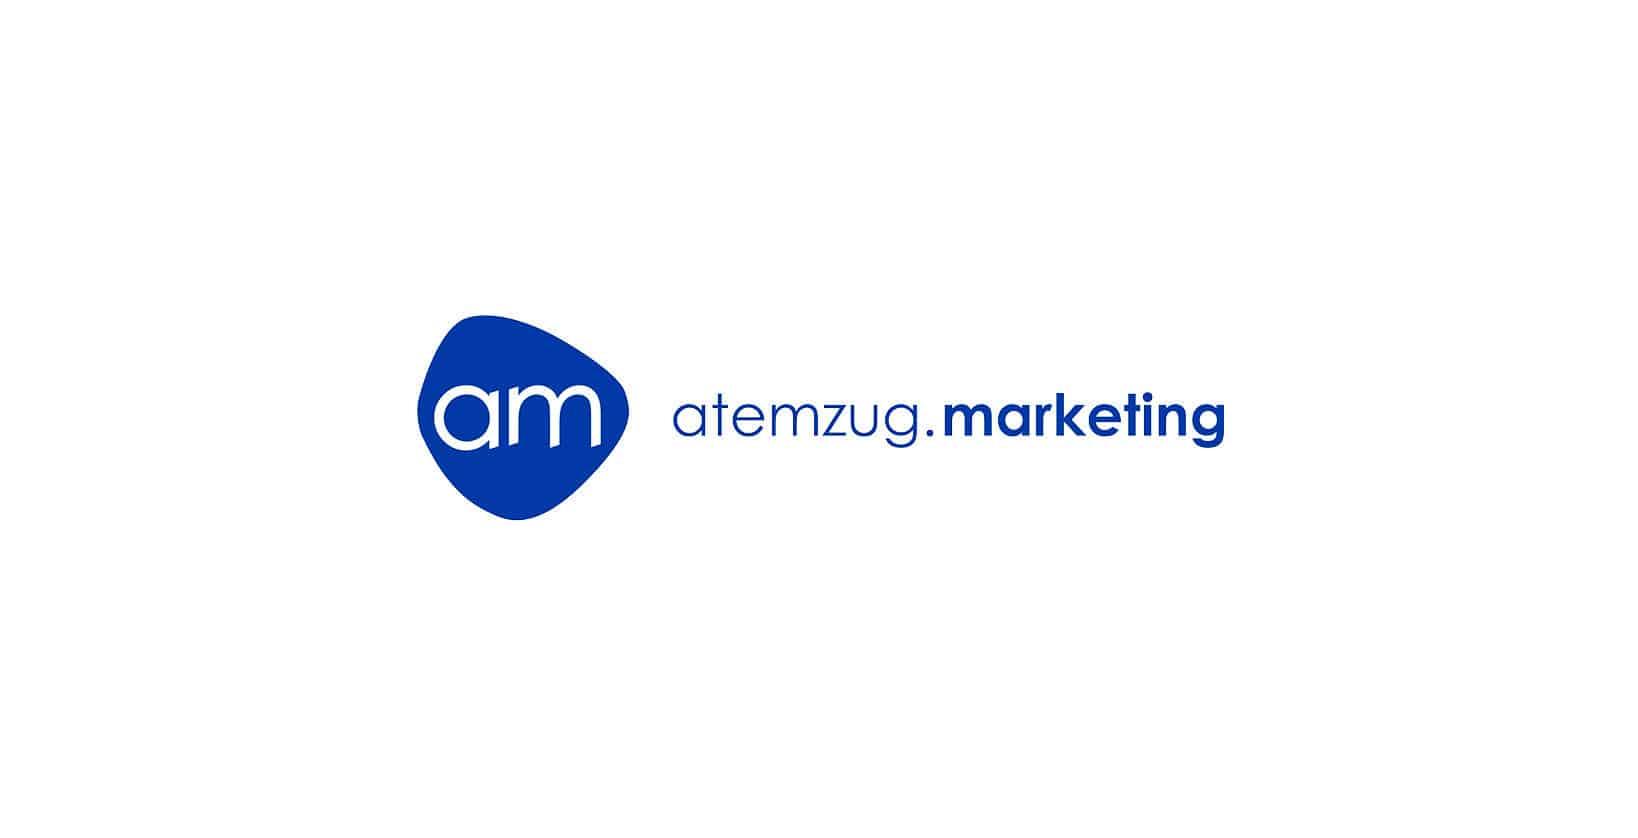 Logo2 atemzug marketing